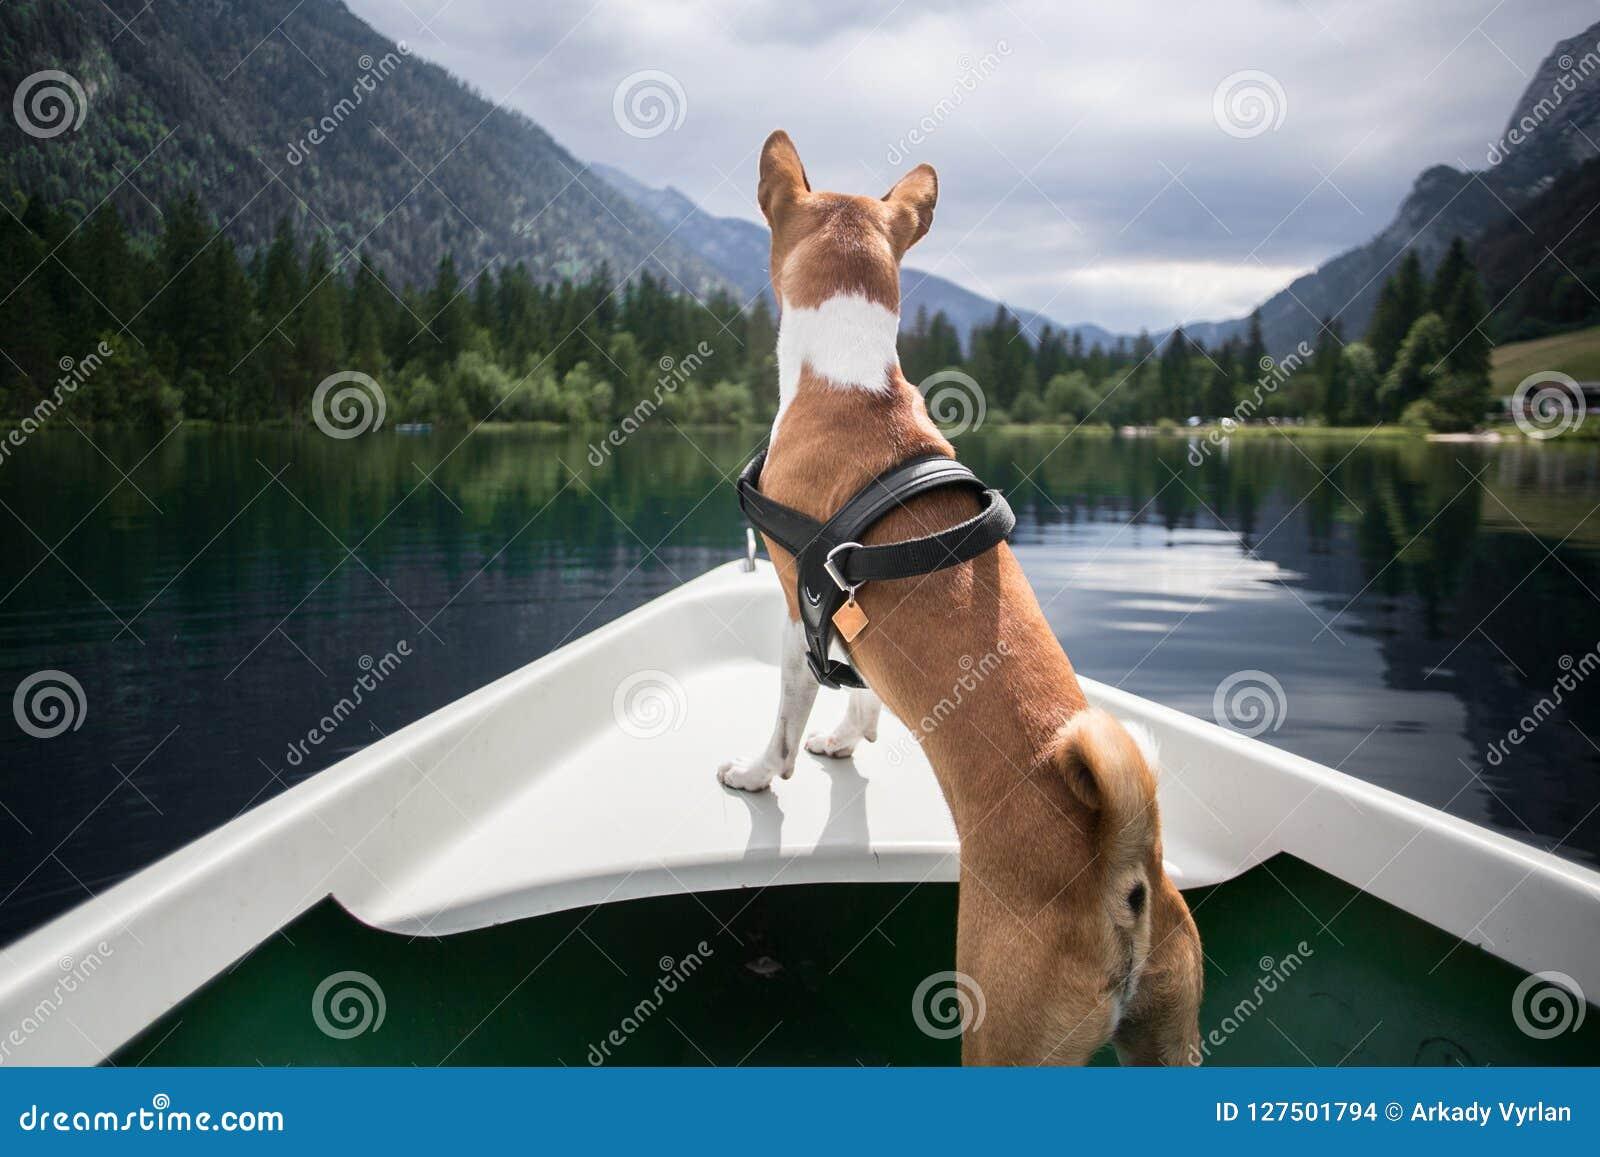 Basenji dog sits on boat at alpine lake